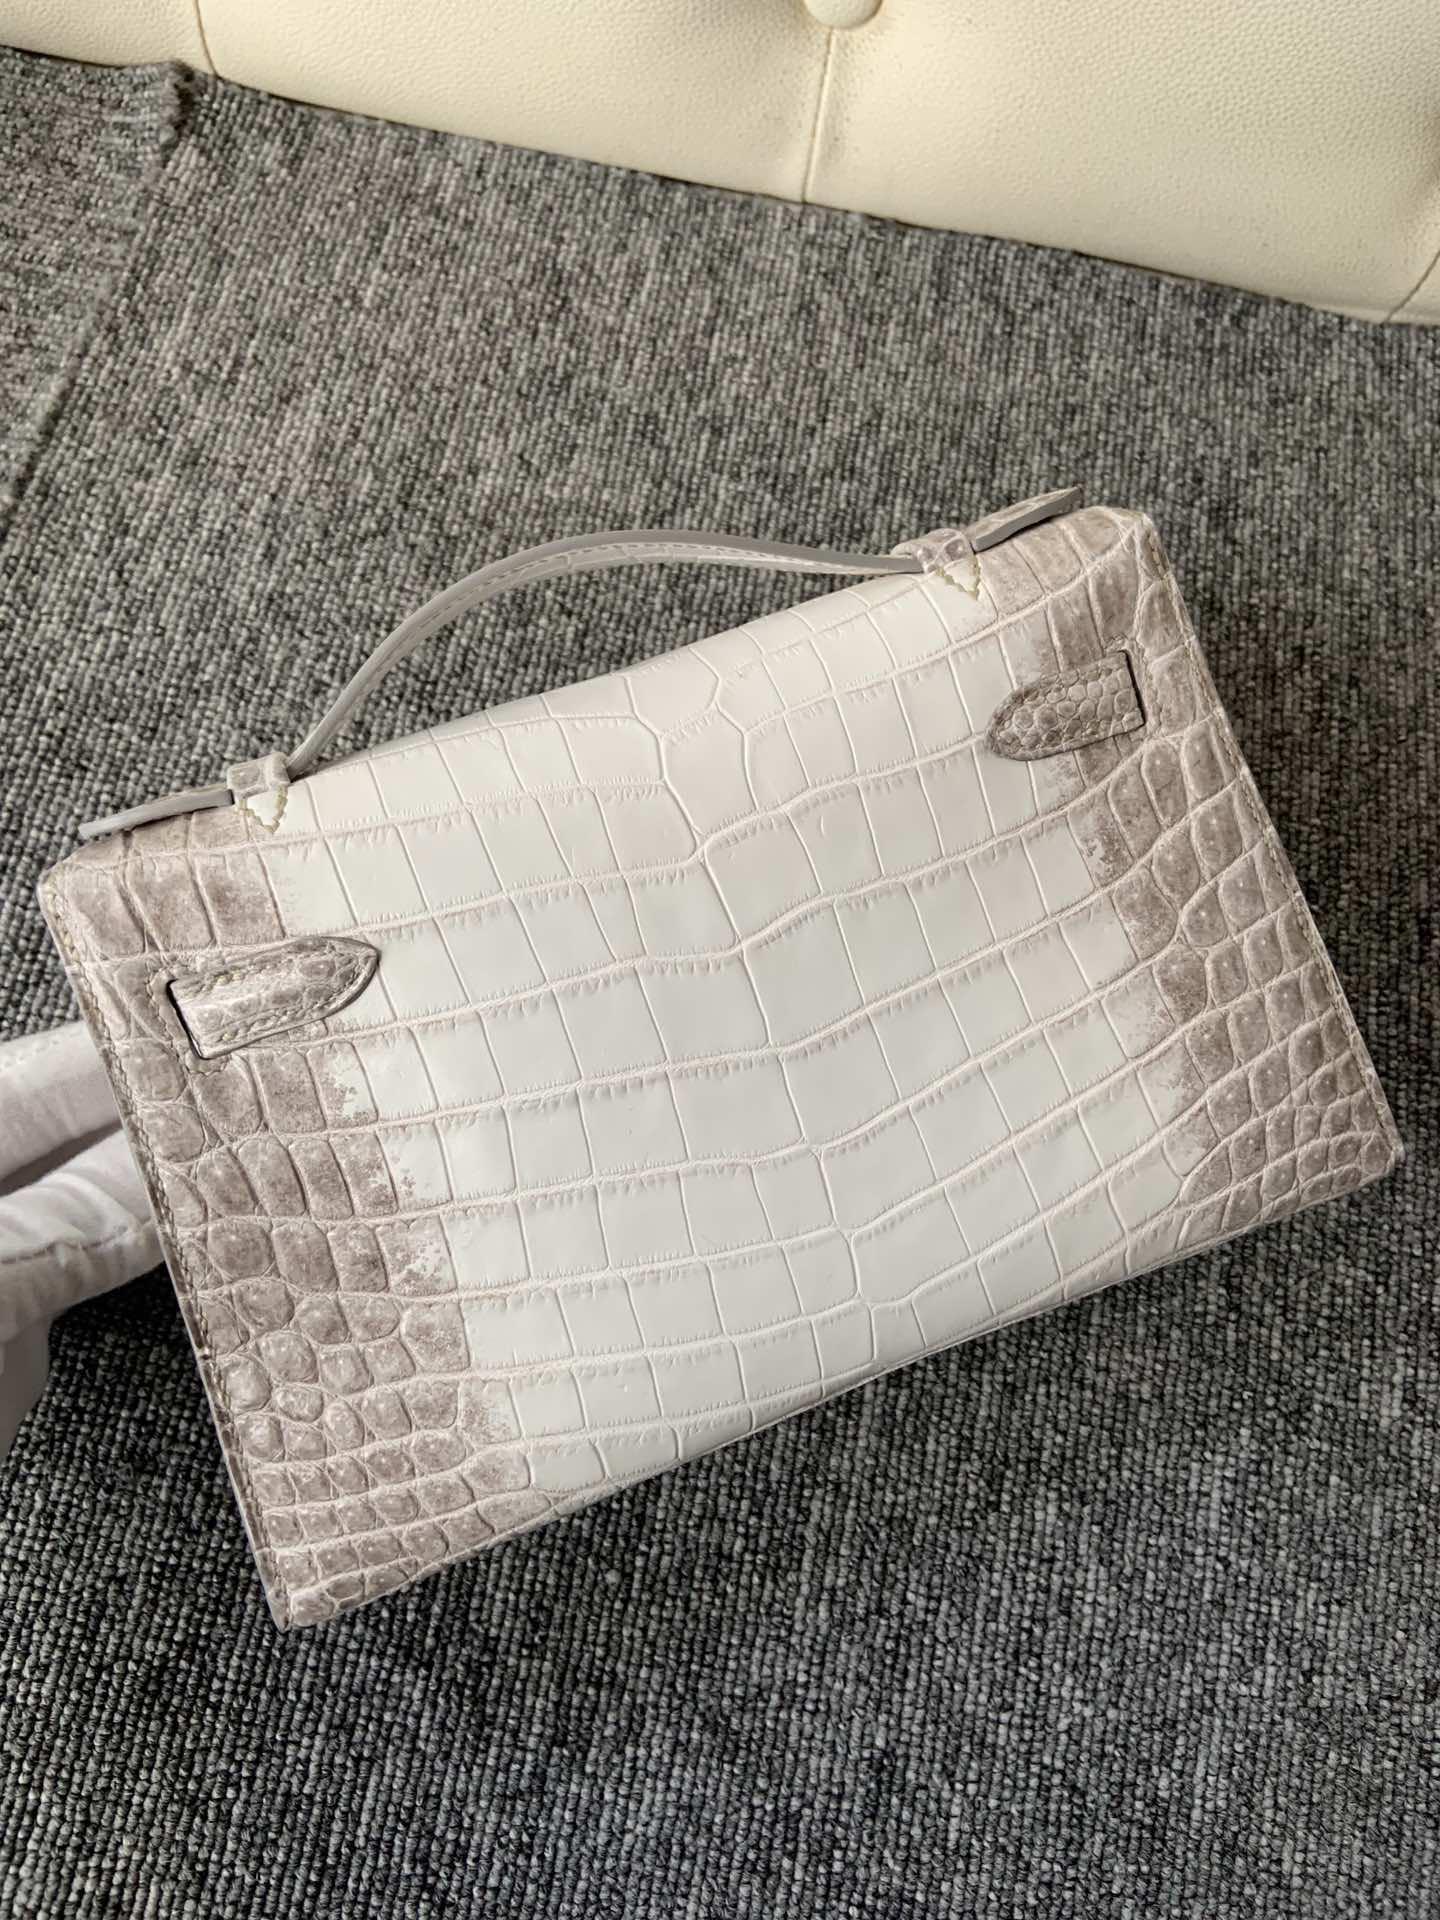 Customize Hermes Himalaya Crocodile Leather Minikelly Pochette 22CM Silver Hardware